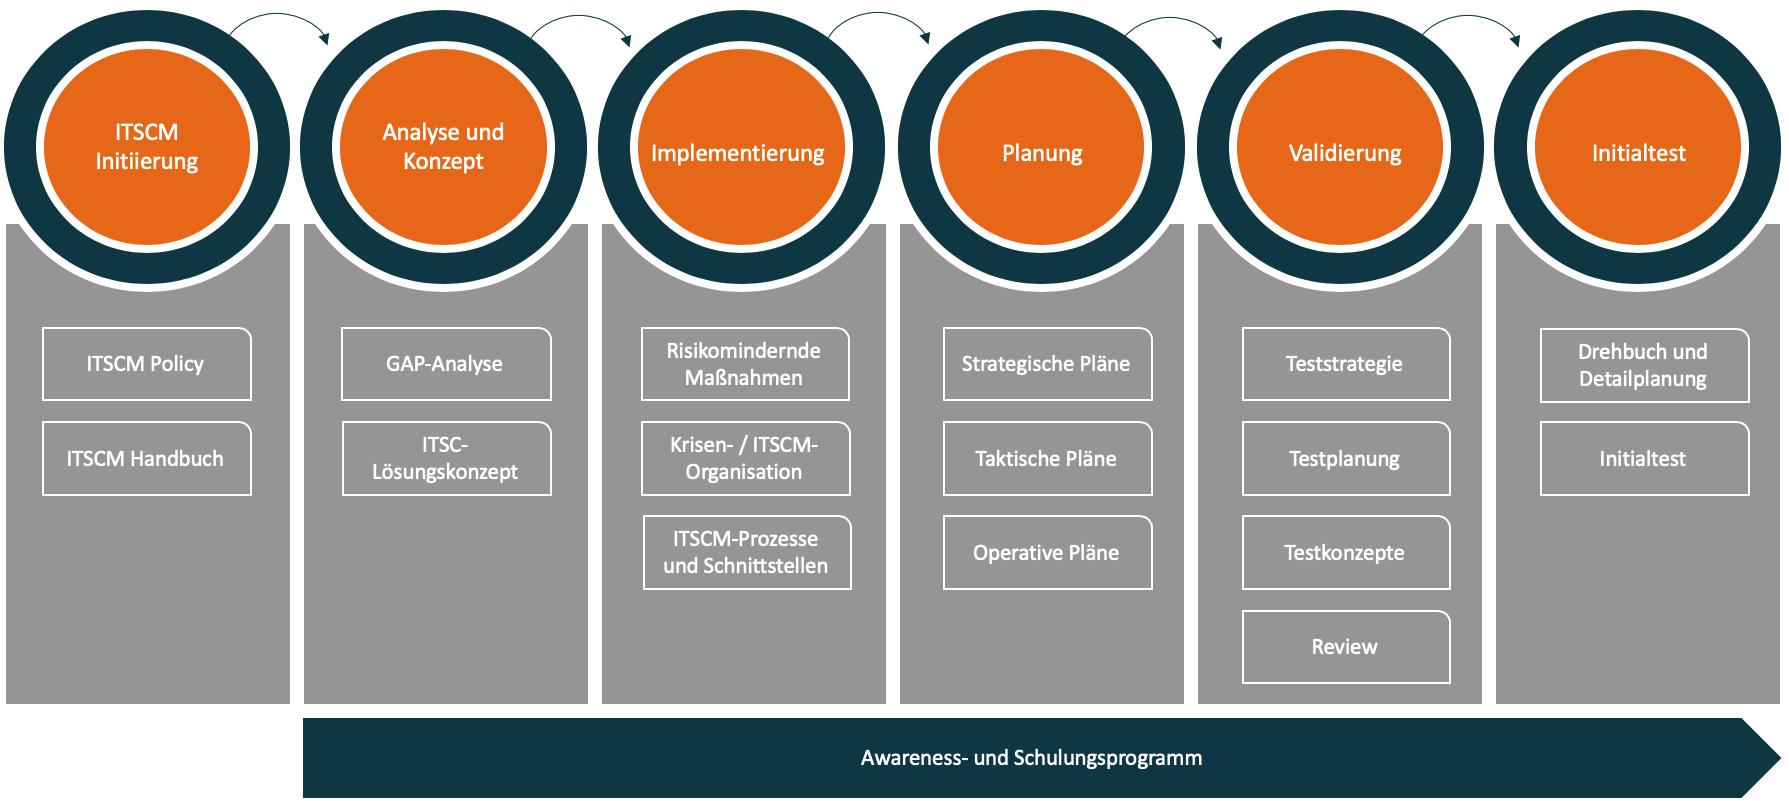 Vorgehensmodell ITSCM